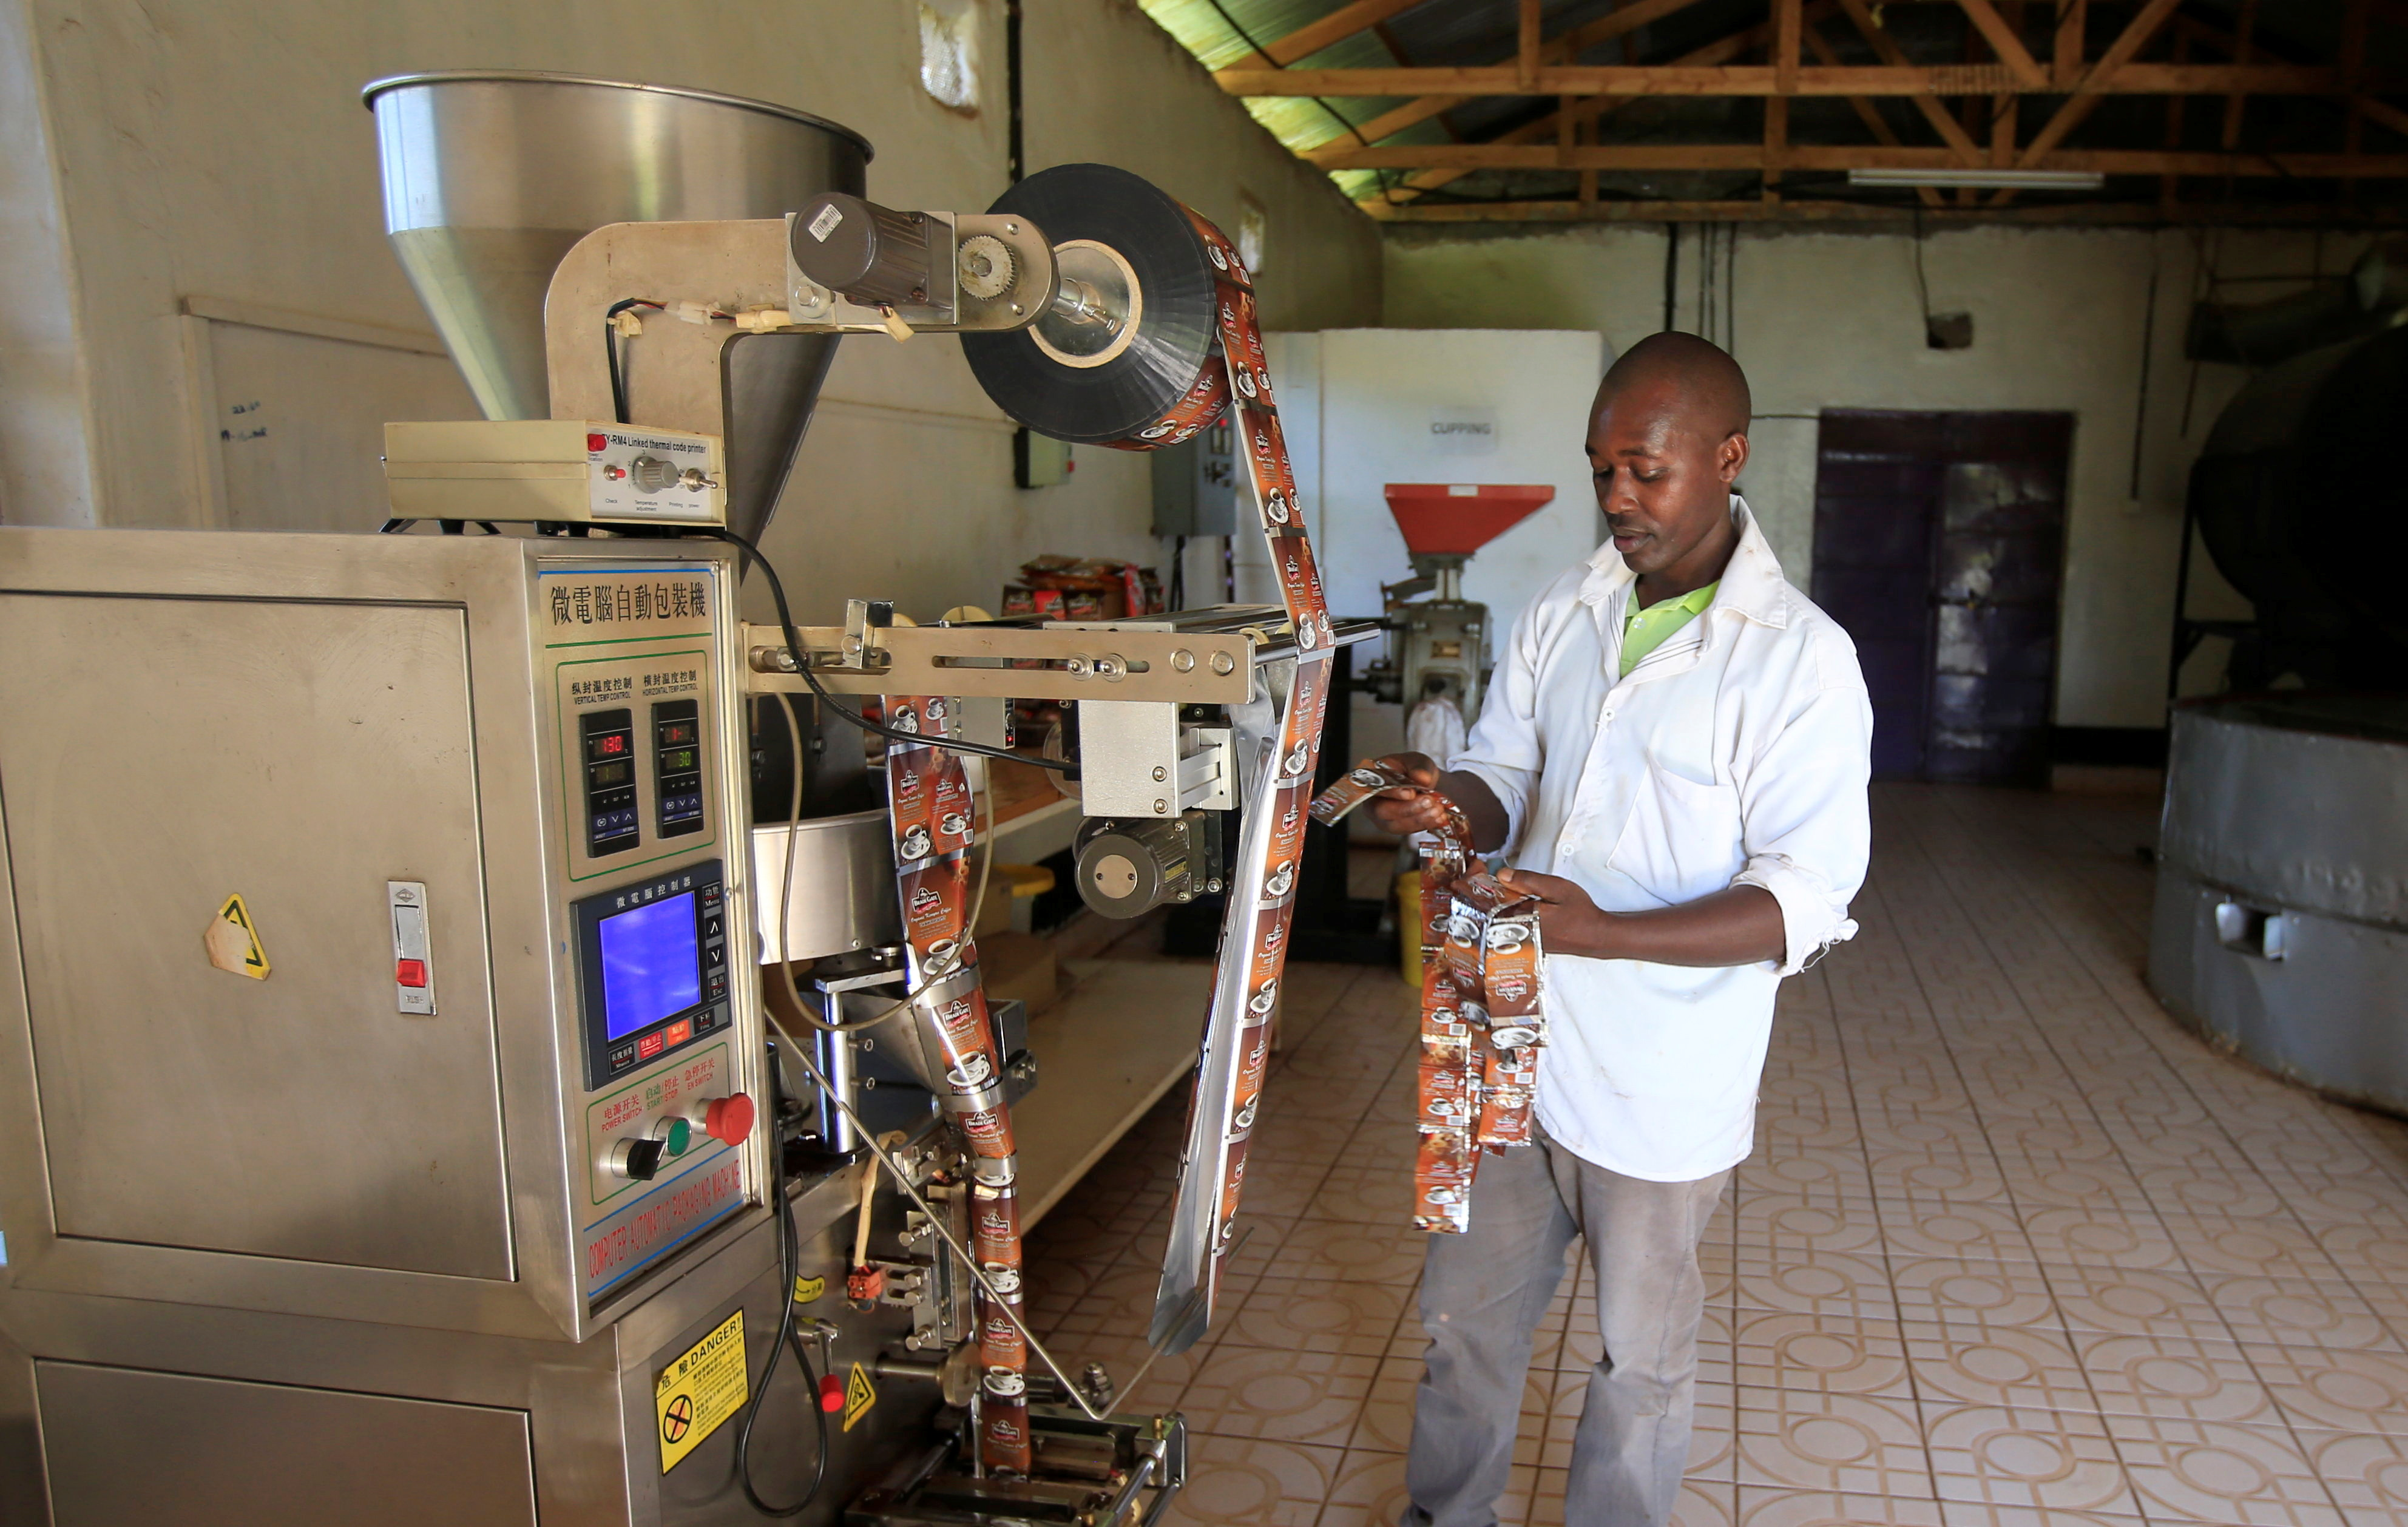 Bradegate coffee factory manager Ephraim Maina sorts coffee sachets after sealing at the factory in Karatina near Nyeri town, Kenya June 3, 2021. REUTERS/Monicah Mwangi